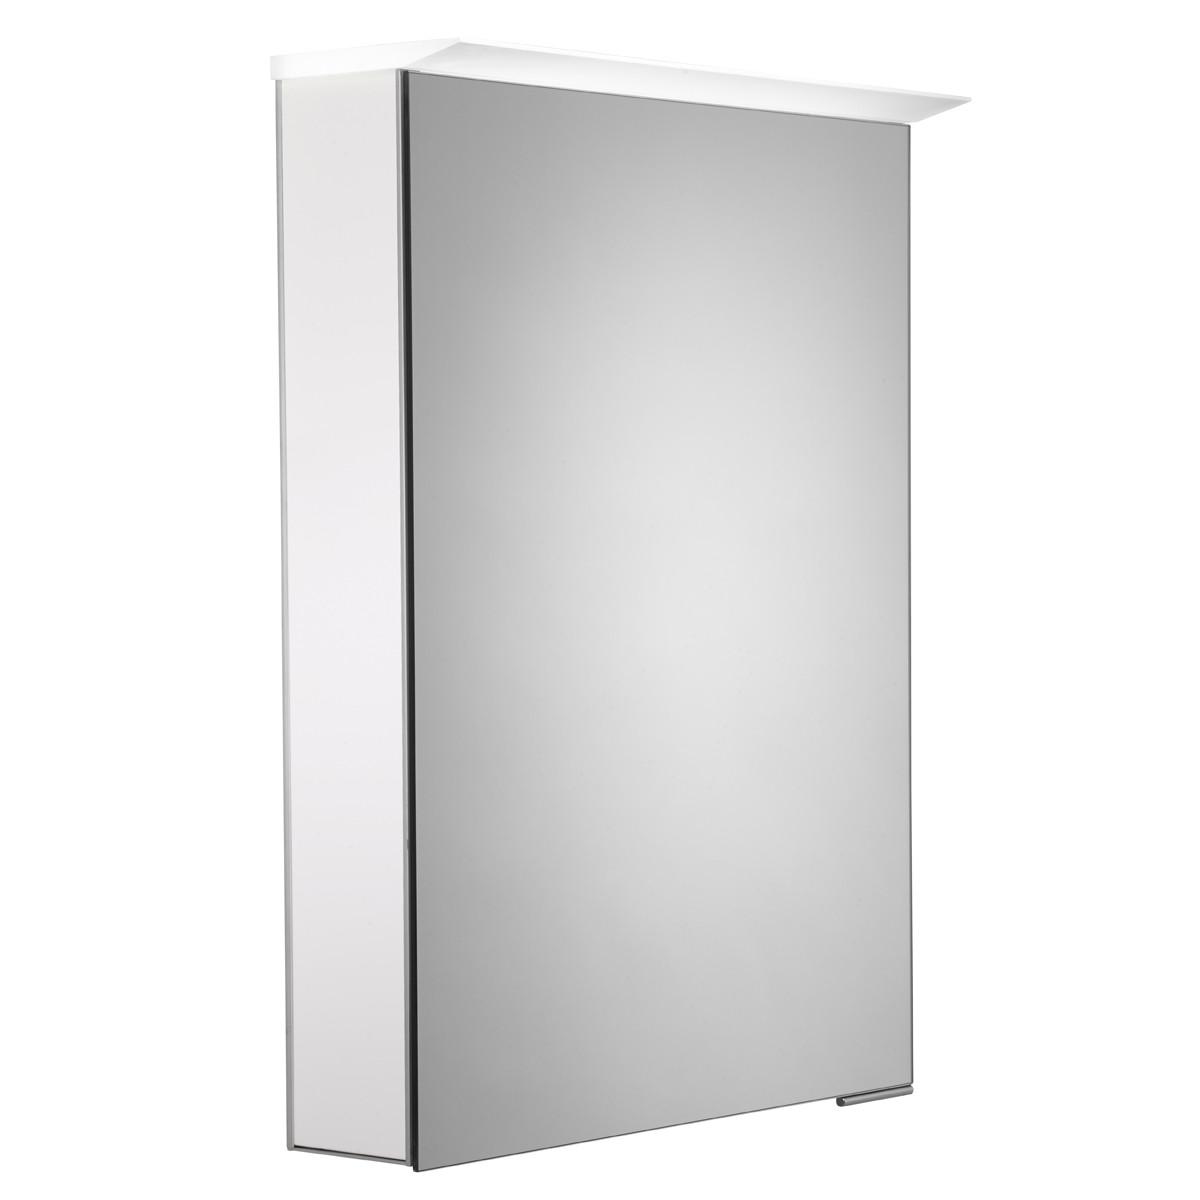 roper rhodes virtue led illuminated bathroom cabinet in